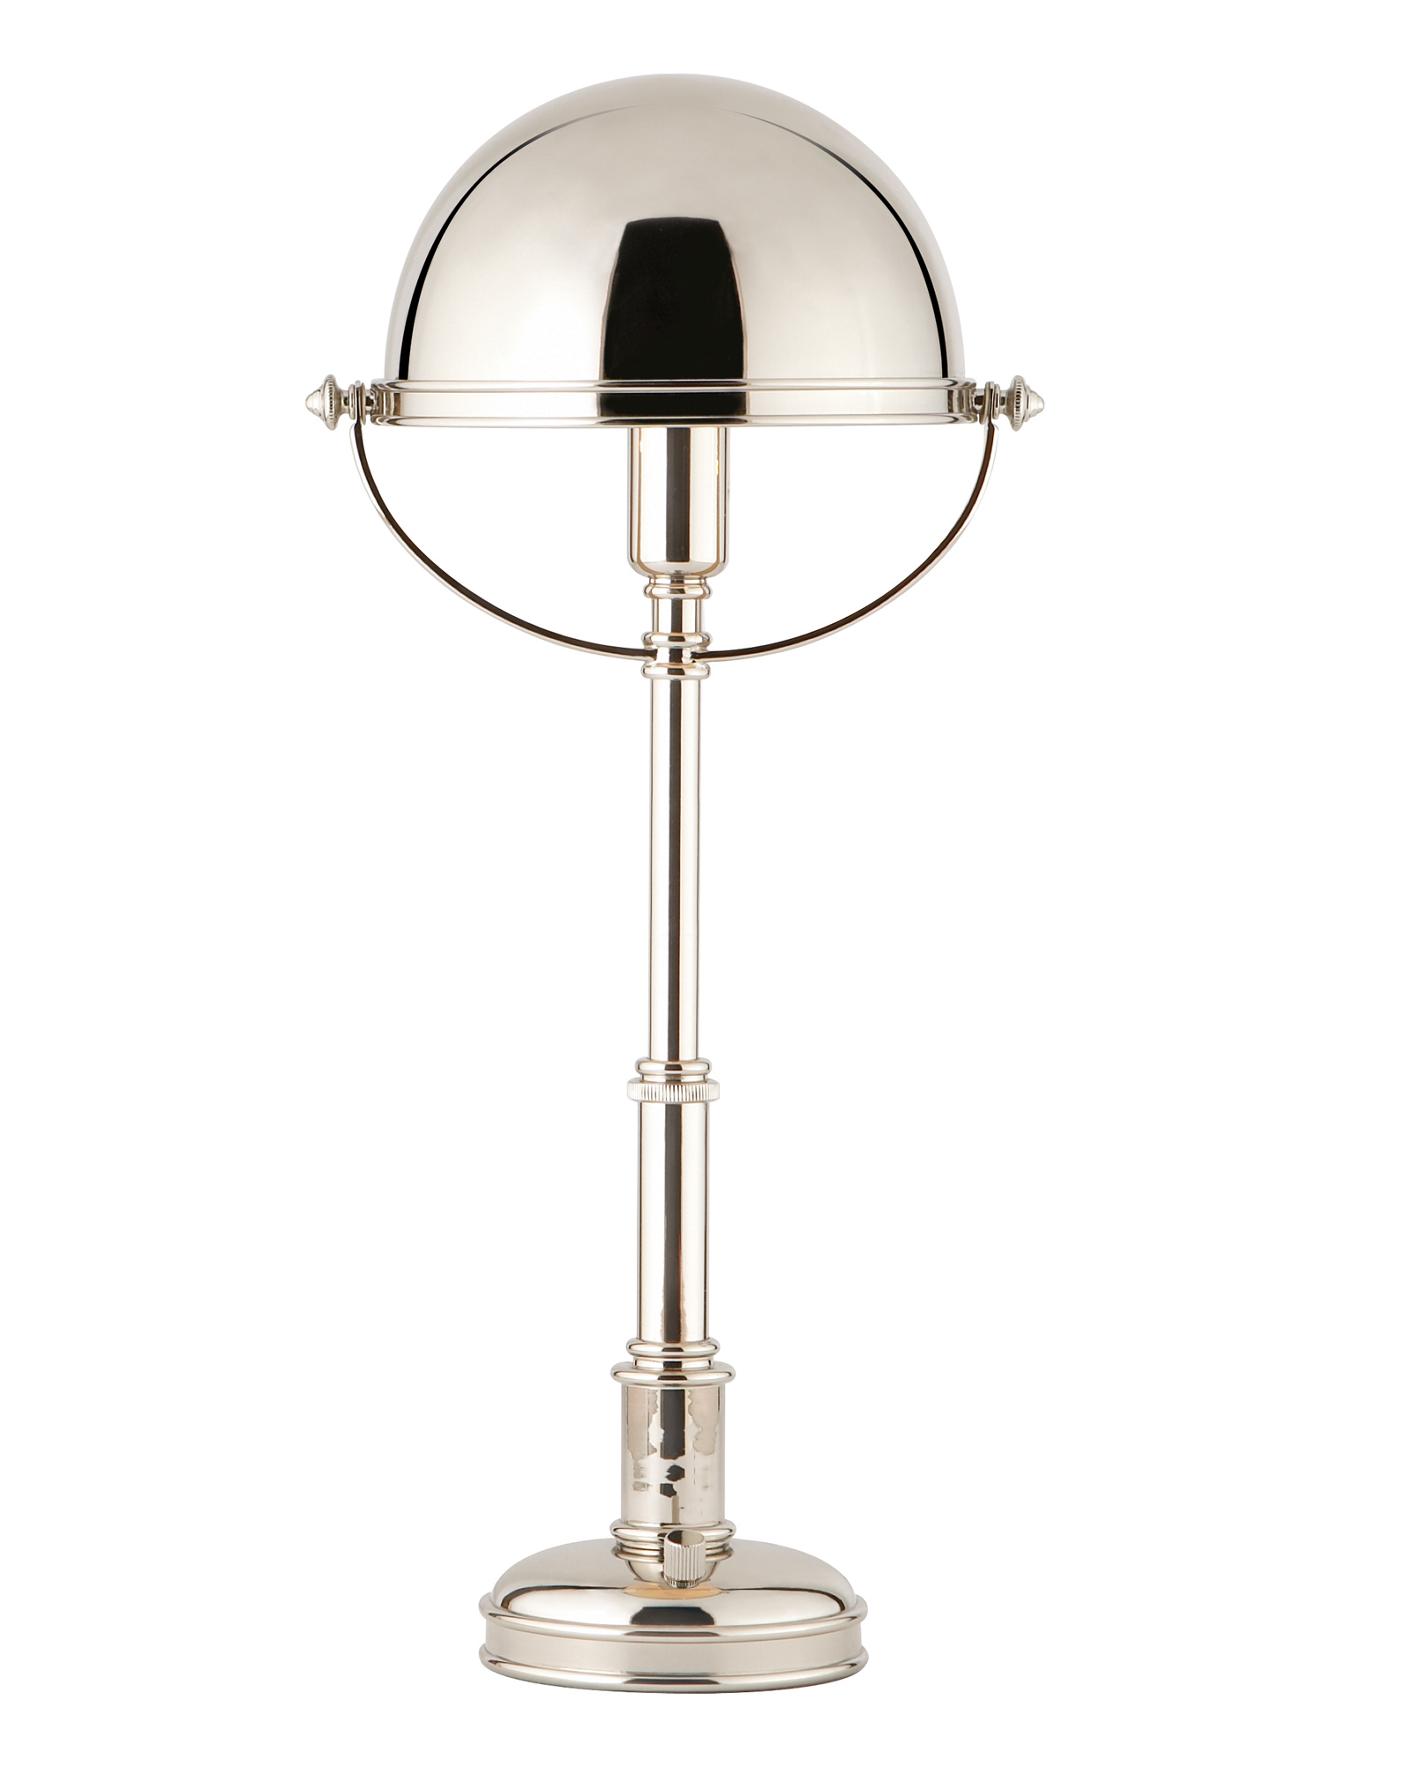 Western table lamps - Helmet Mini Table Lamp Ralph Lauren Home Table Lamps Ralphlauren Com